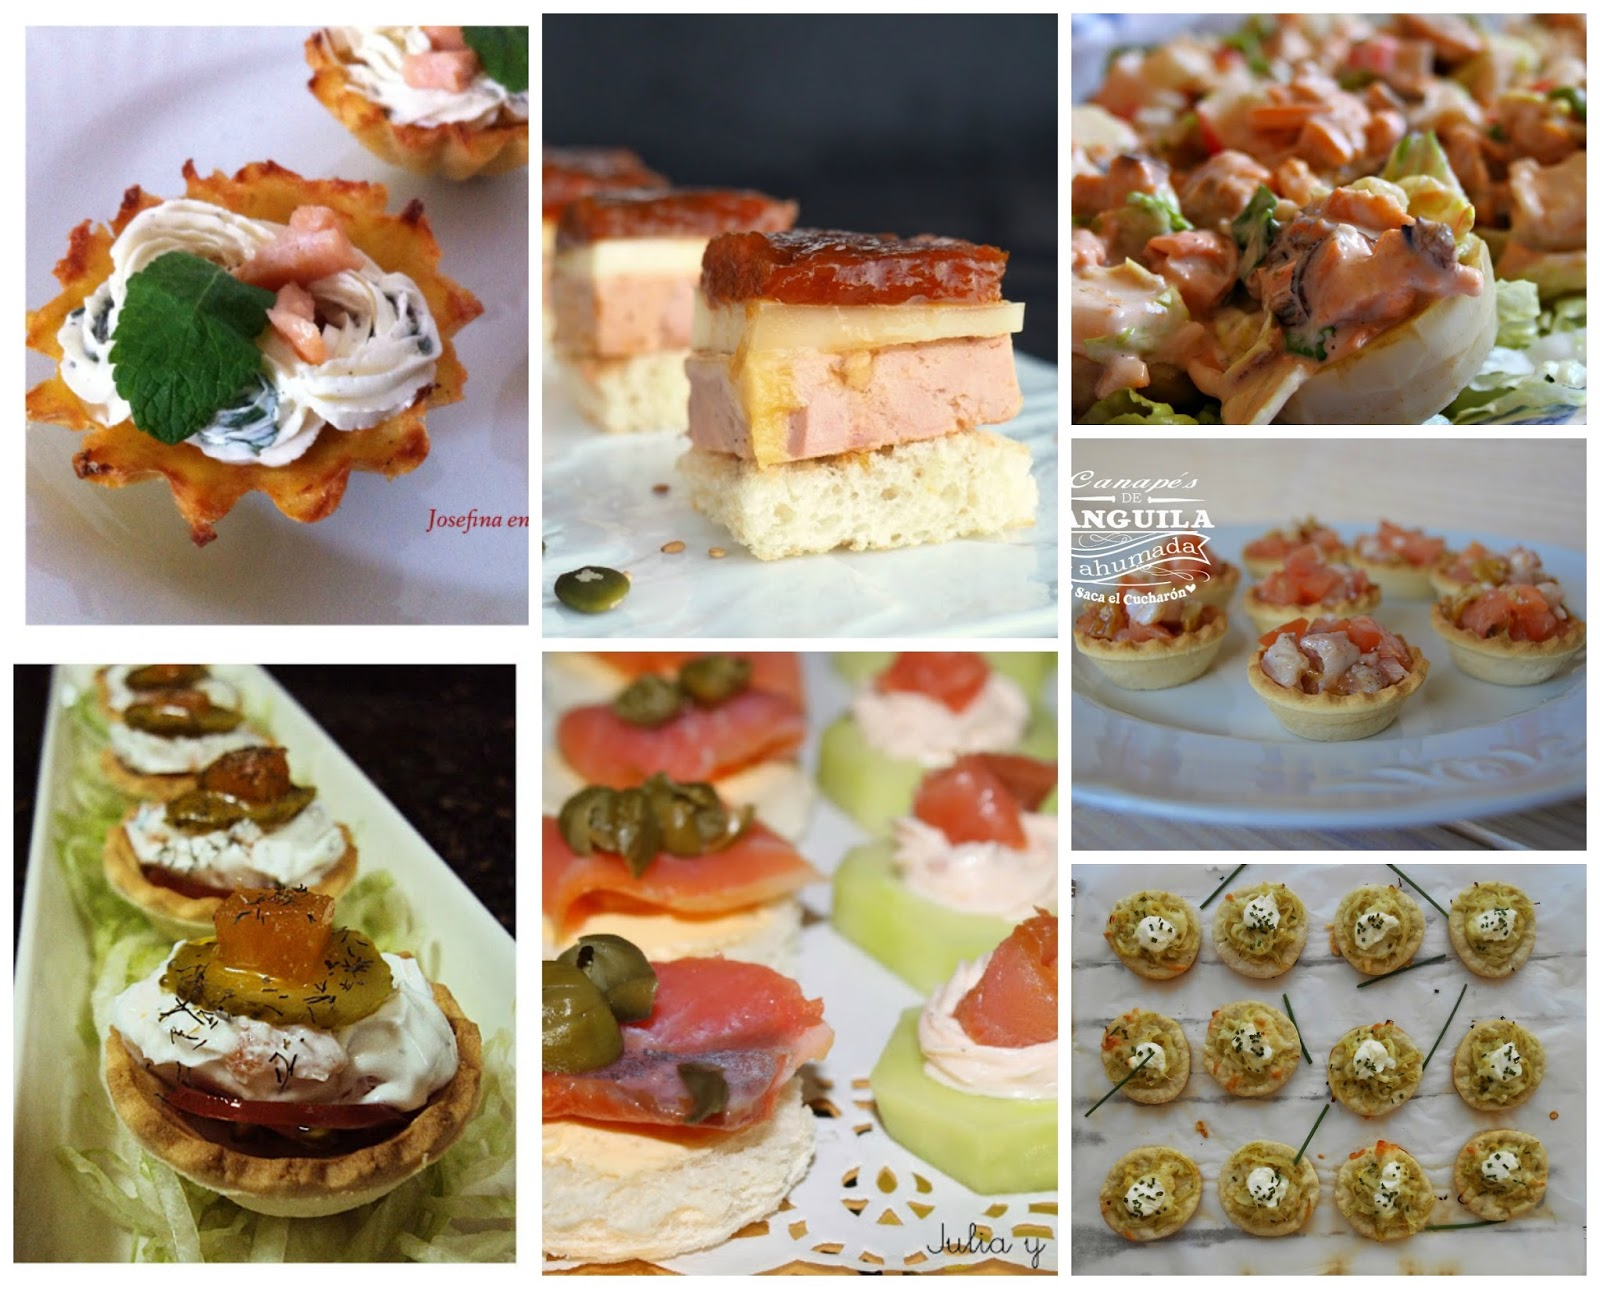 Canap s de fiesta cocina - Ofertas en canapes ...